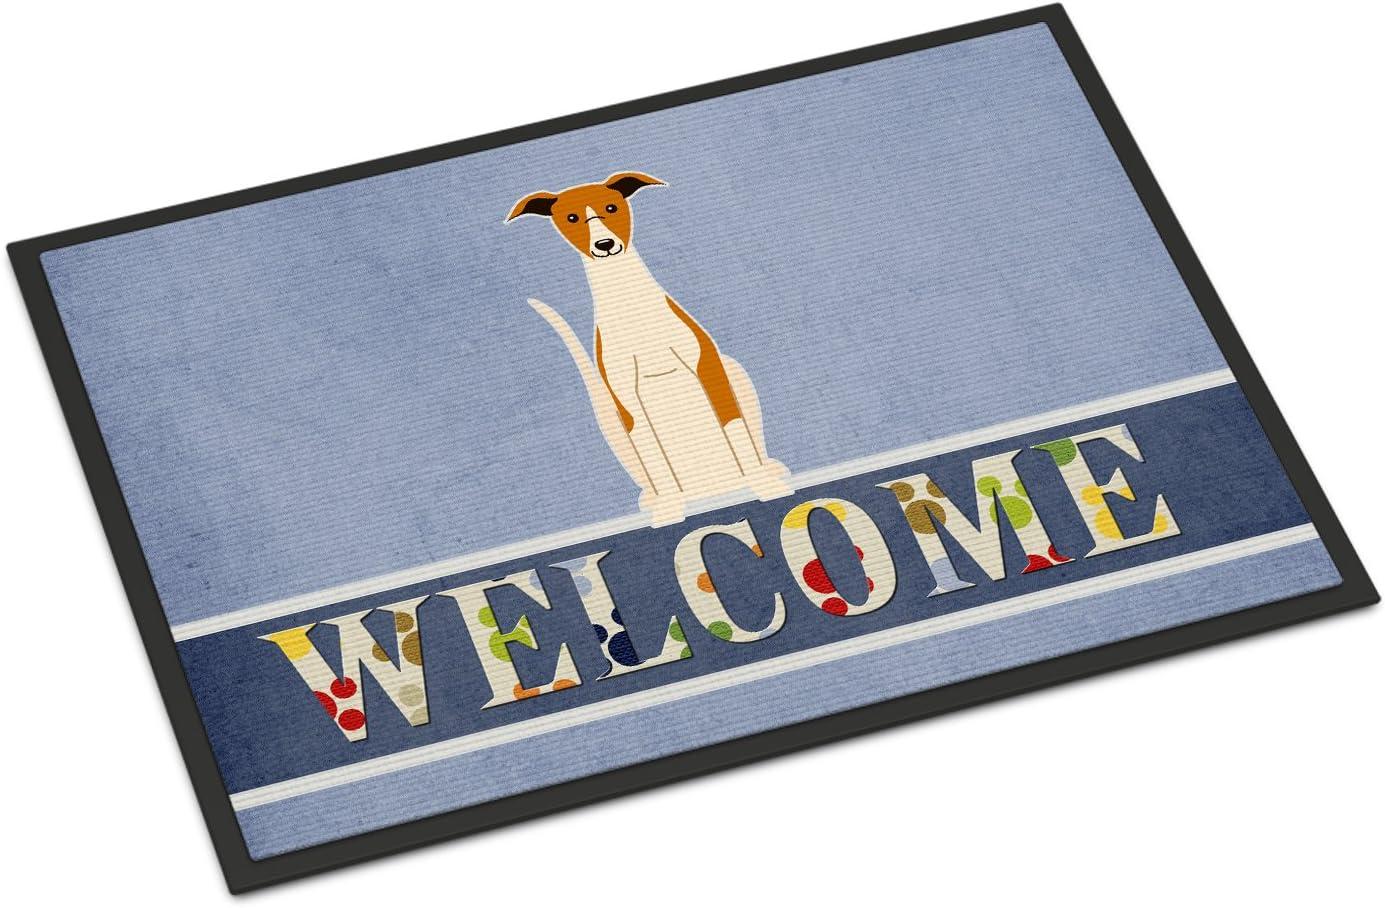 Bungalow Flooring Premium Comfort Floor Mat, 22 by 31-Inch, French Pet Menu